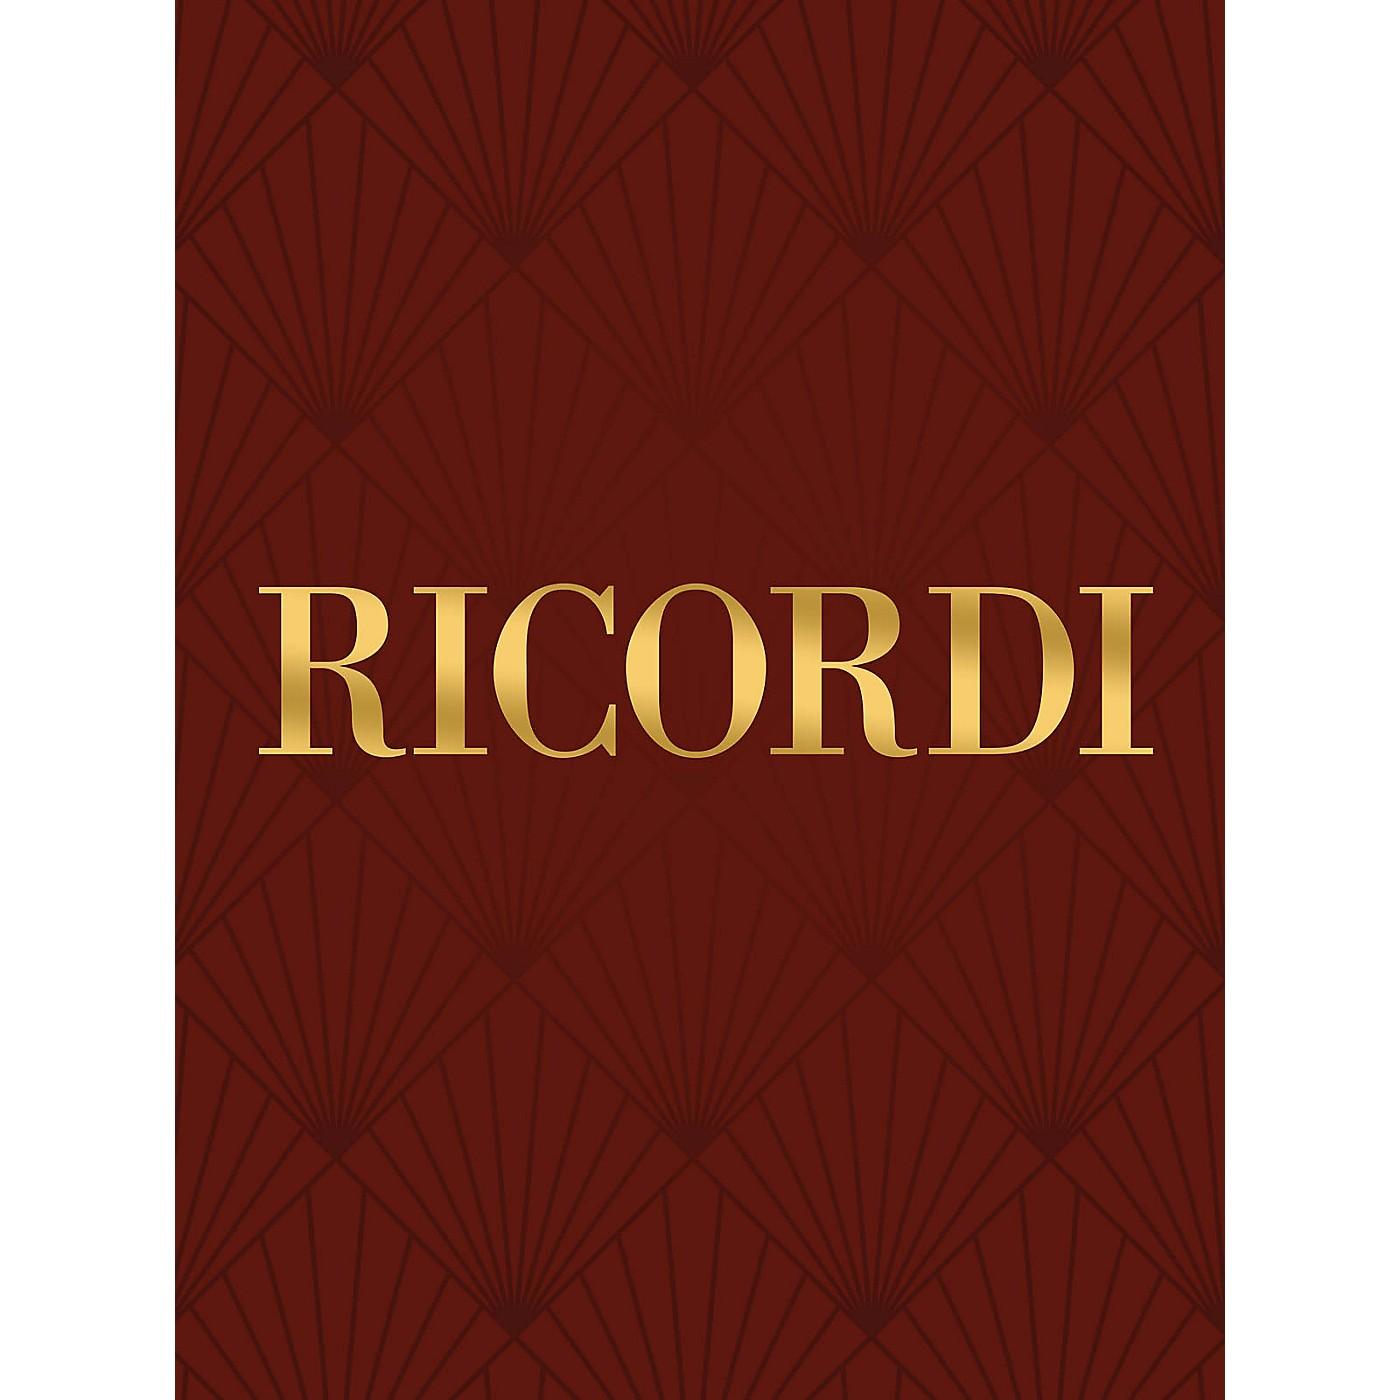 Hal Leonard Il Signor Bruschino Critical Edition Full Sc, Hardbound, Two-vol set Study Score by Rossini thumbnail